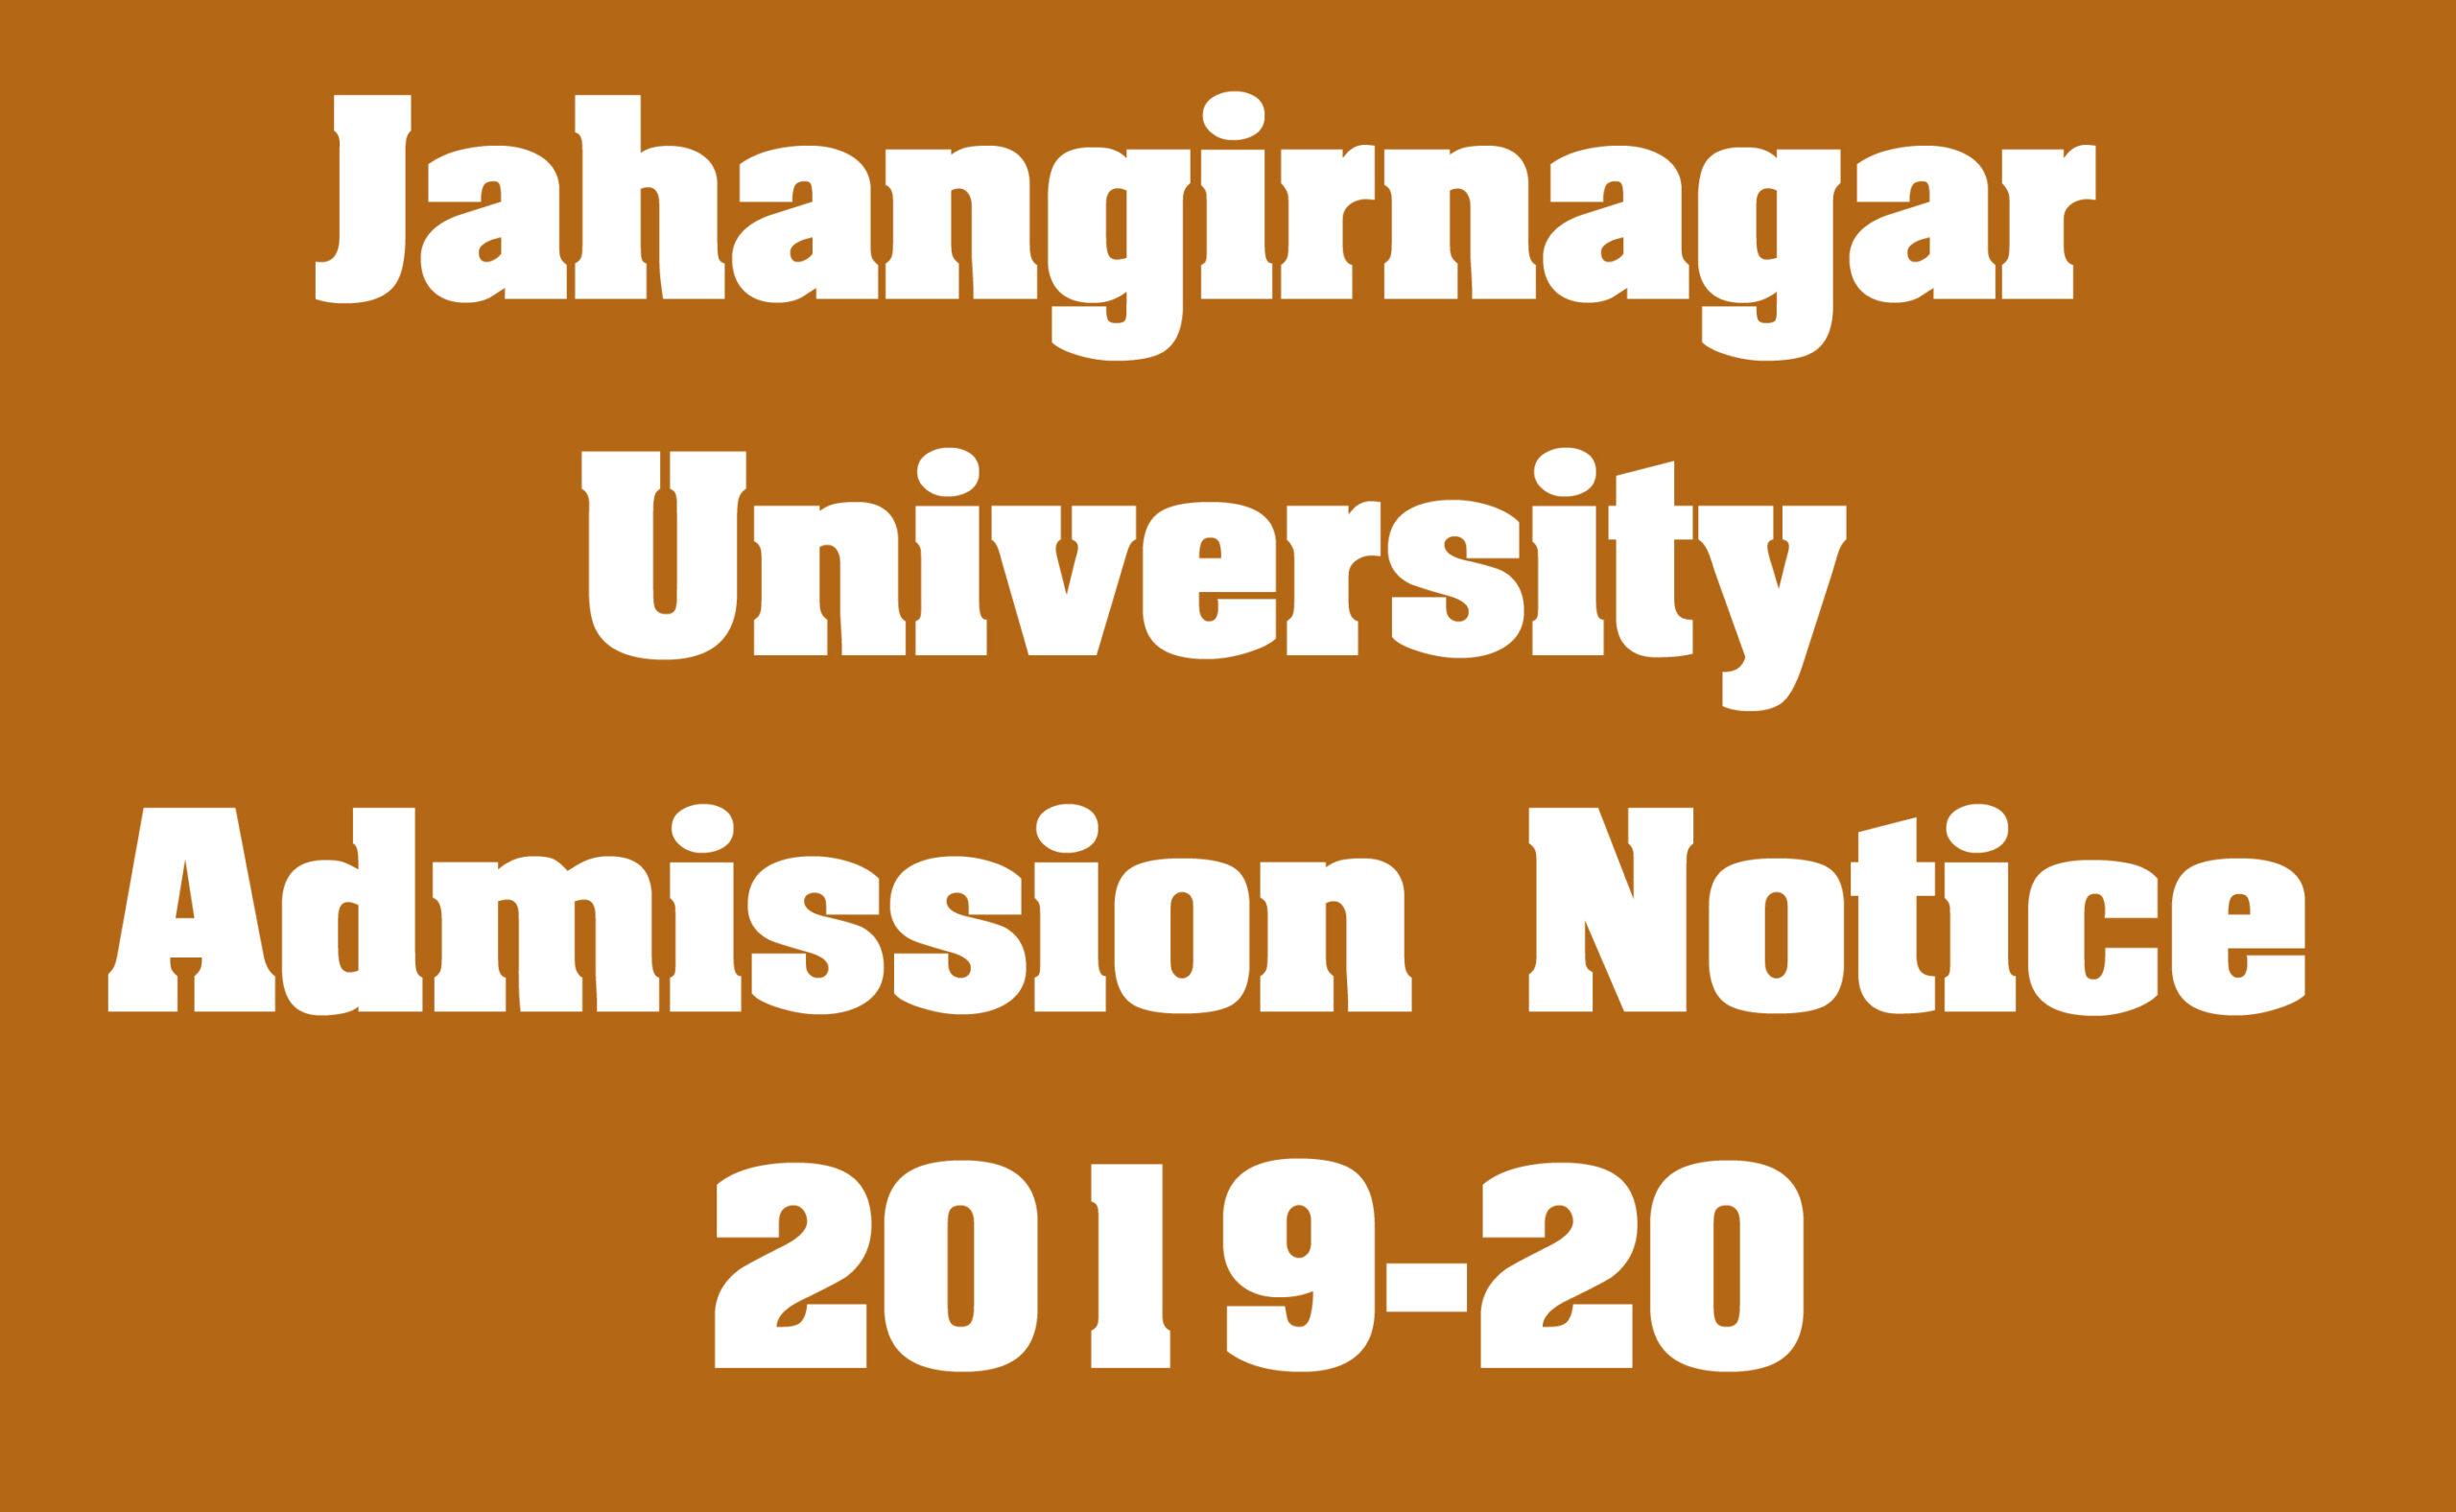 Jahangirnagar University Admission Notice 2019-20